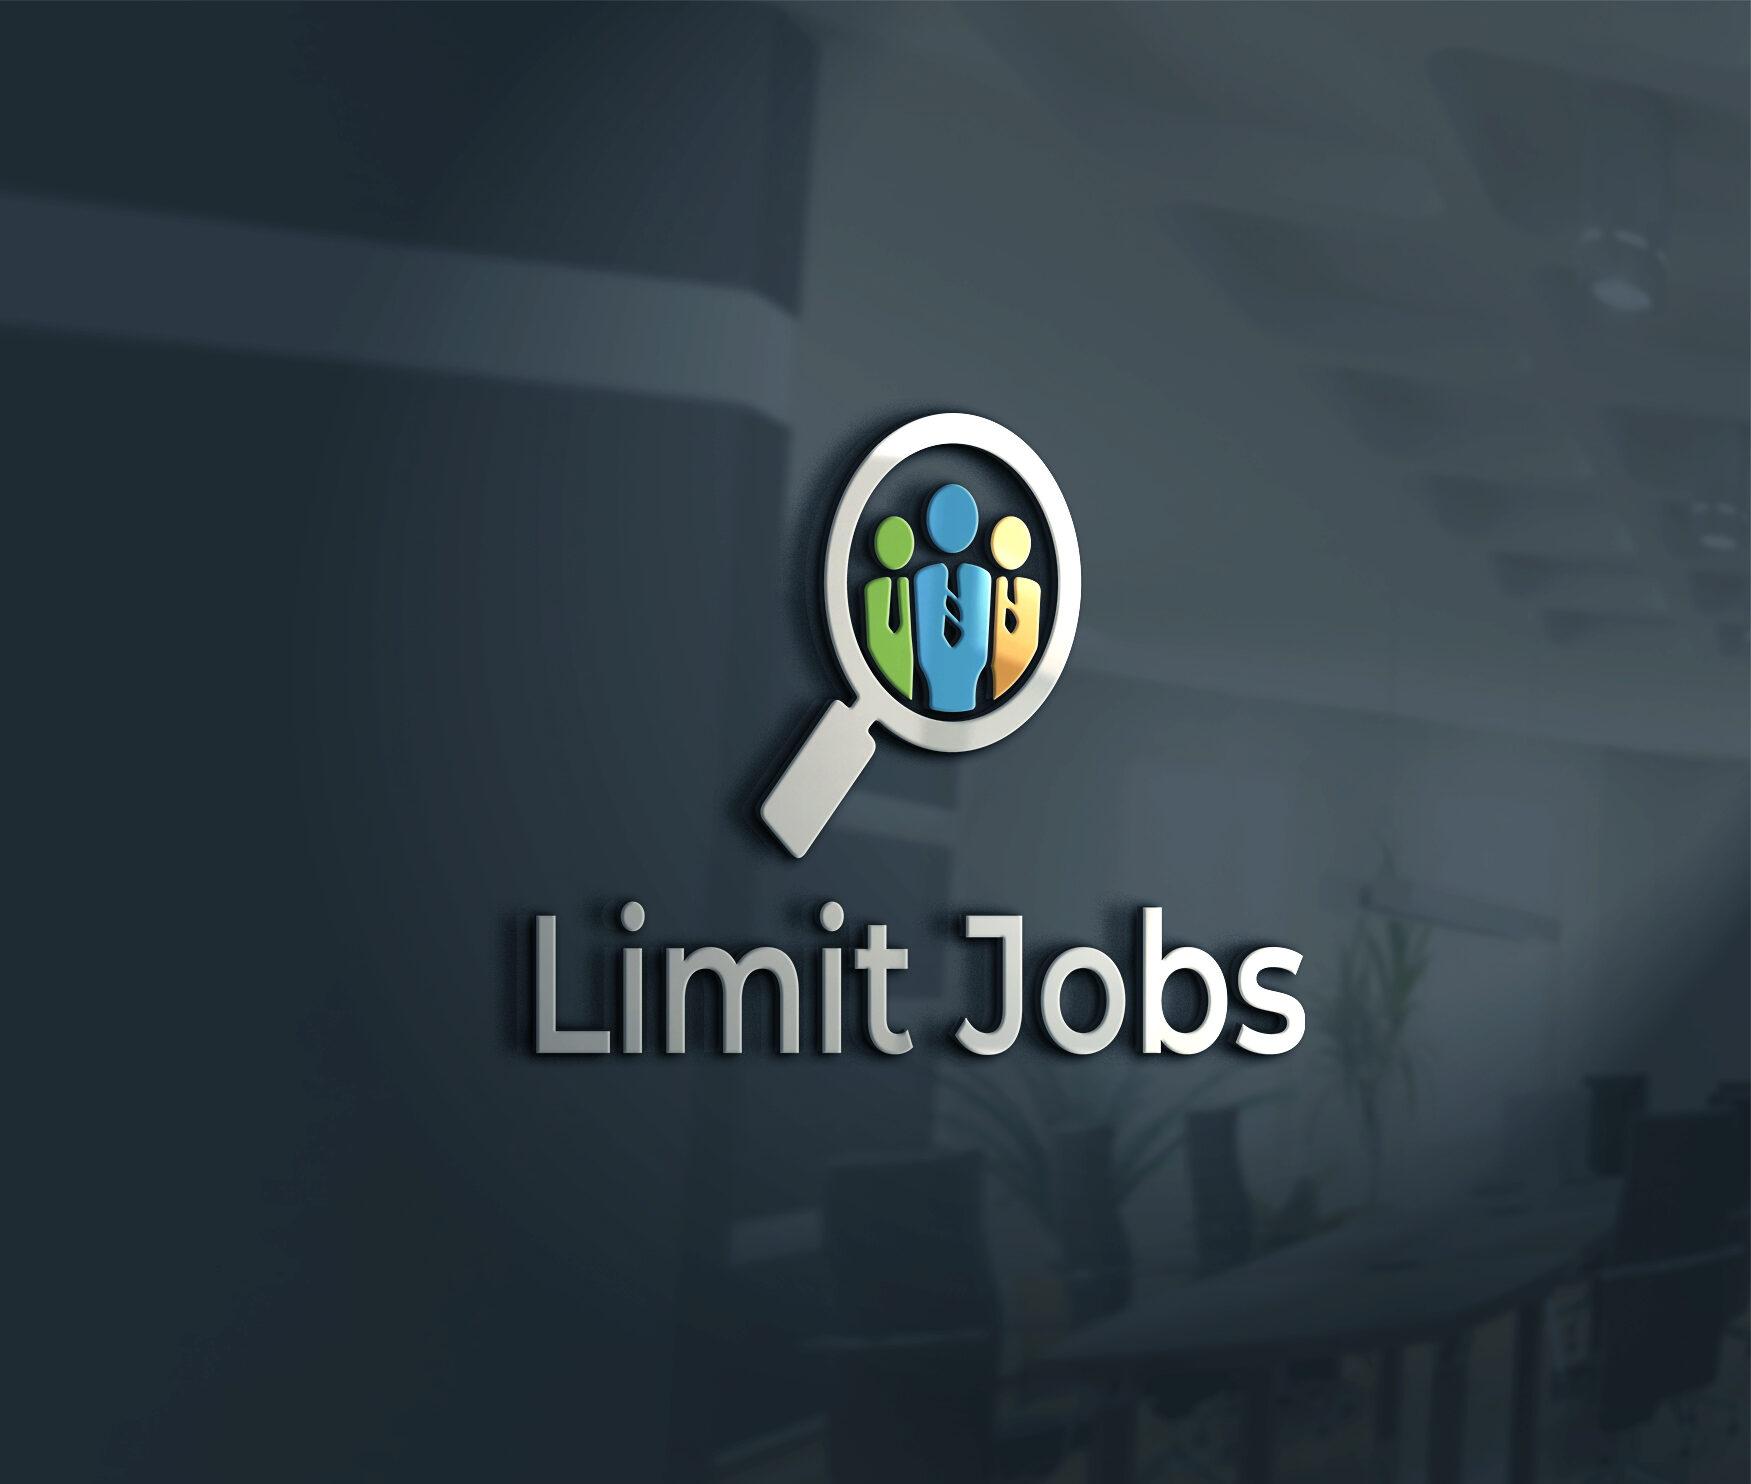 Limit-Jobs